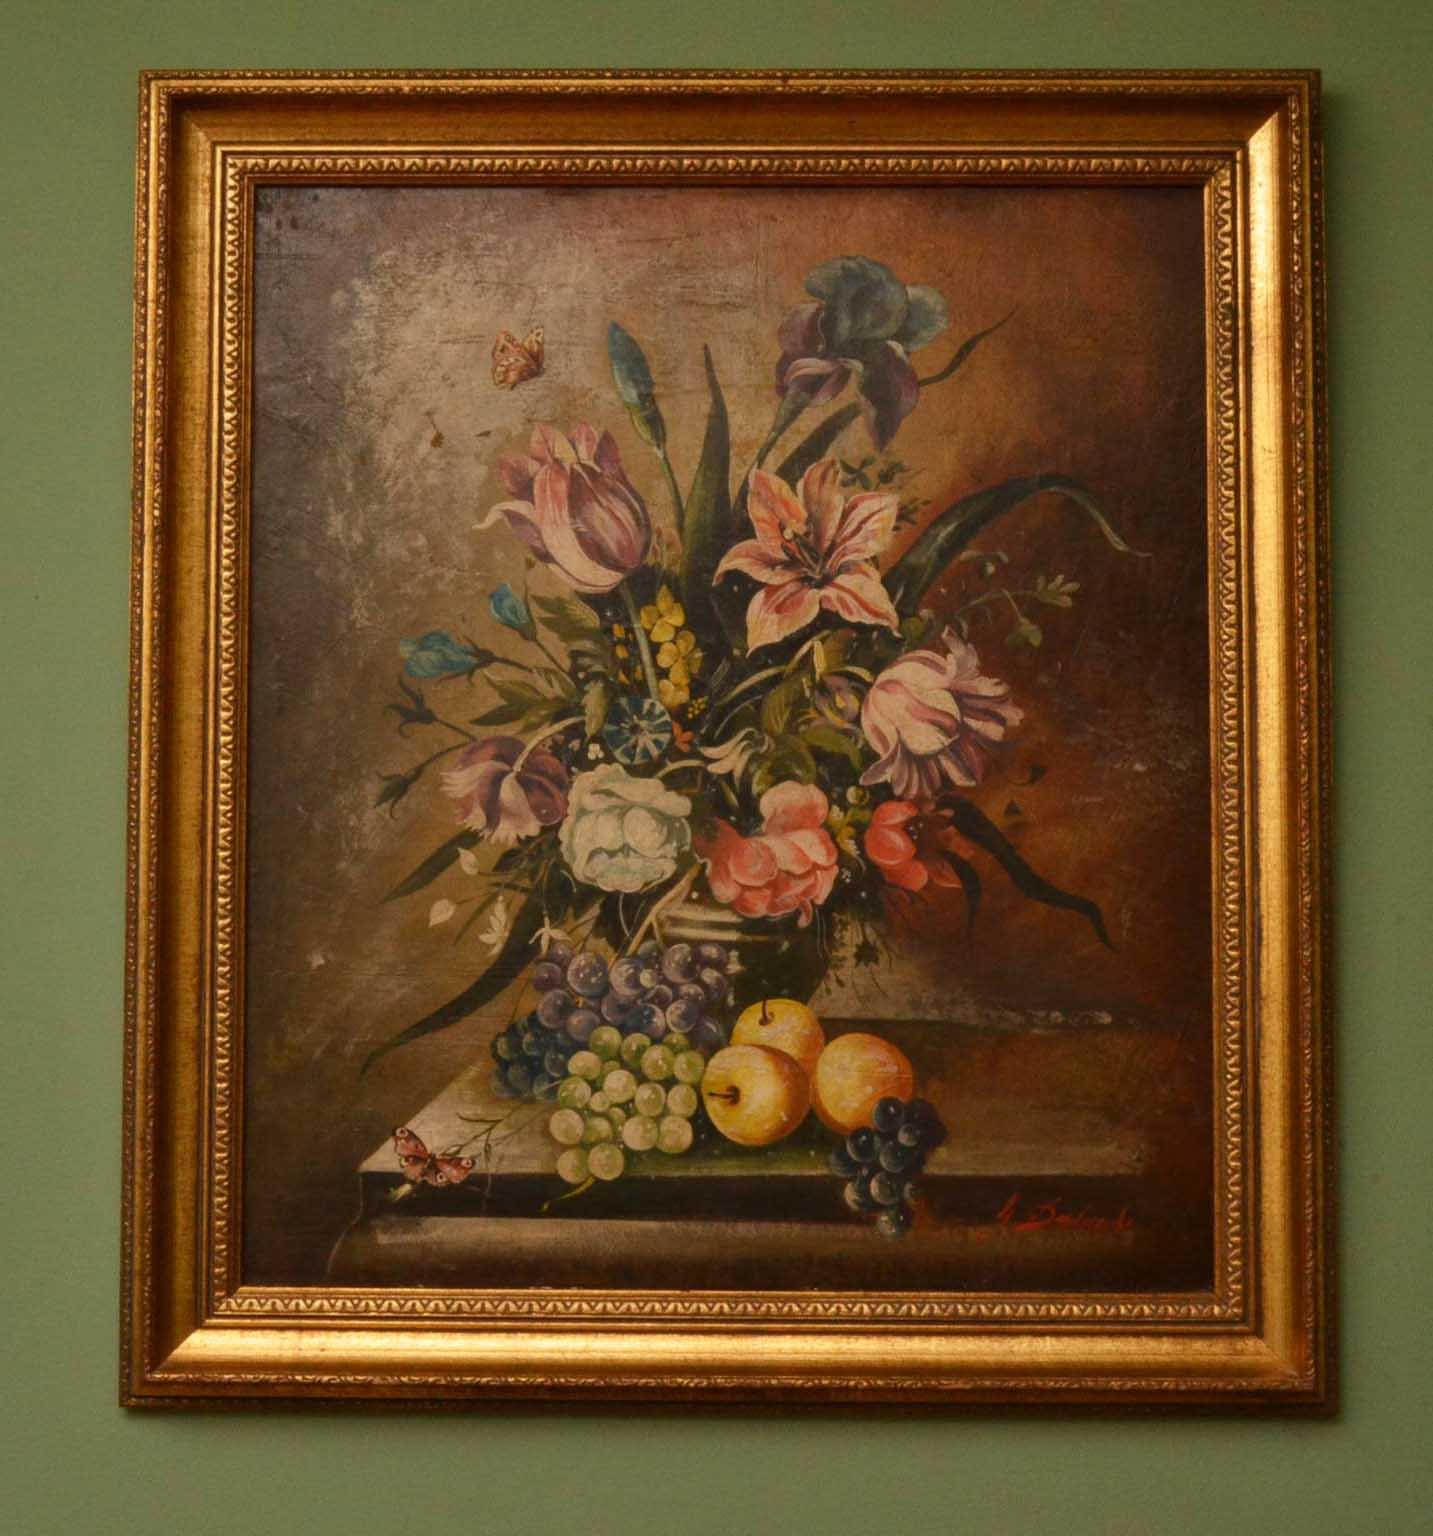 vintage oil painting fiori e frutta fruit flowers ref no 03803